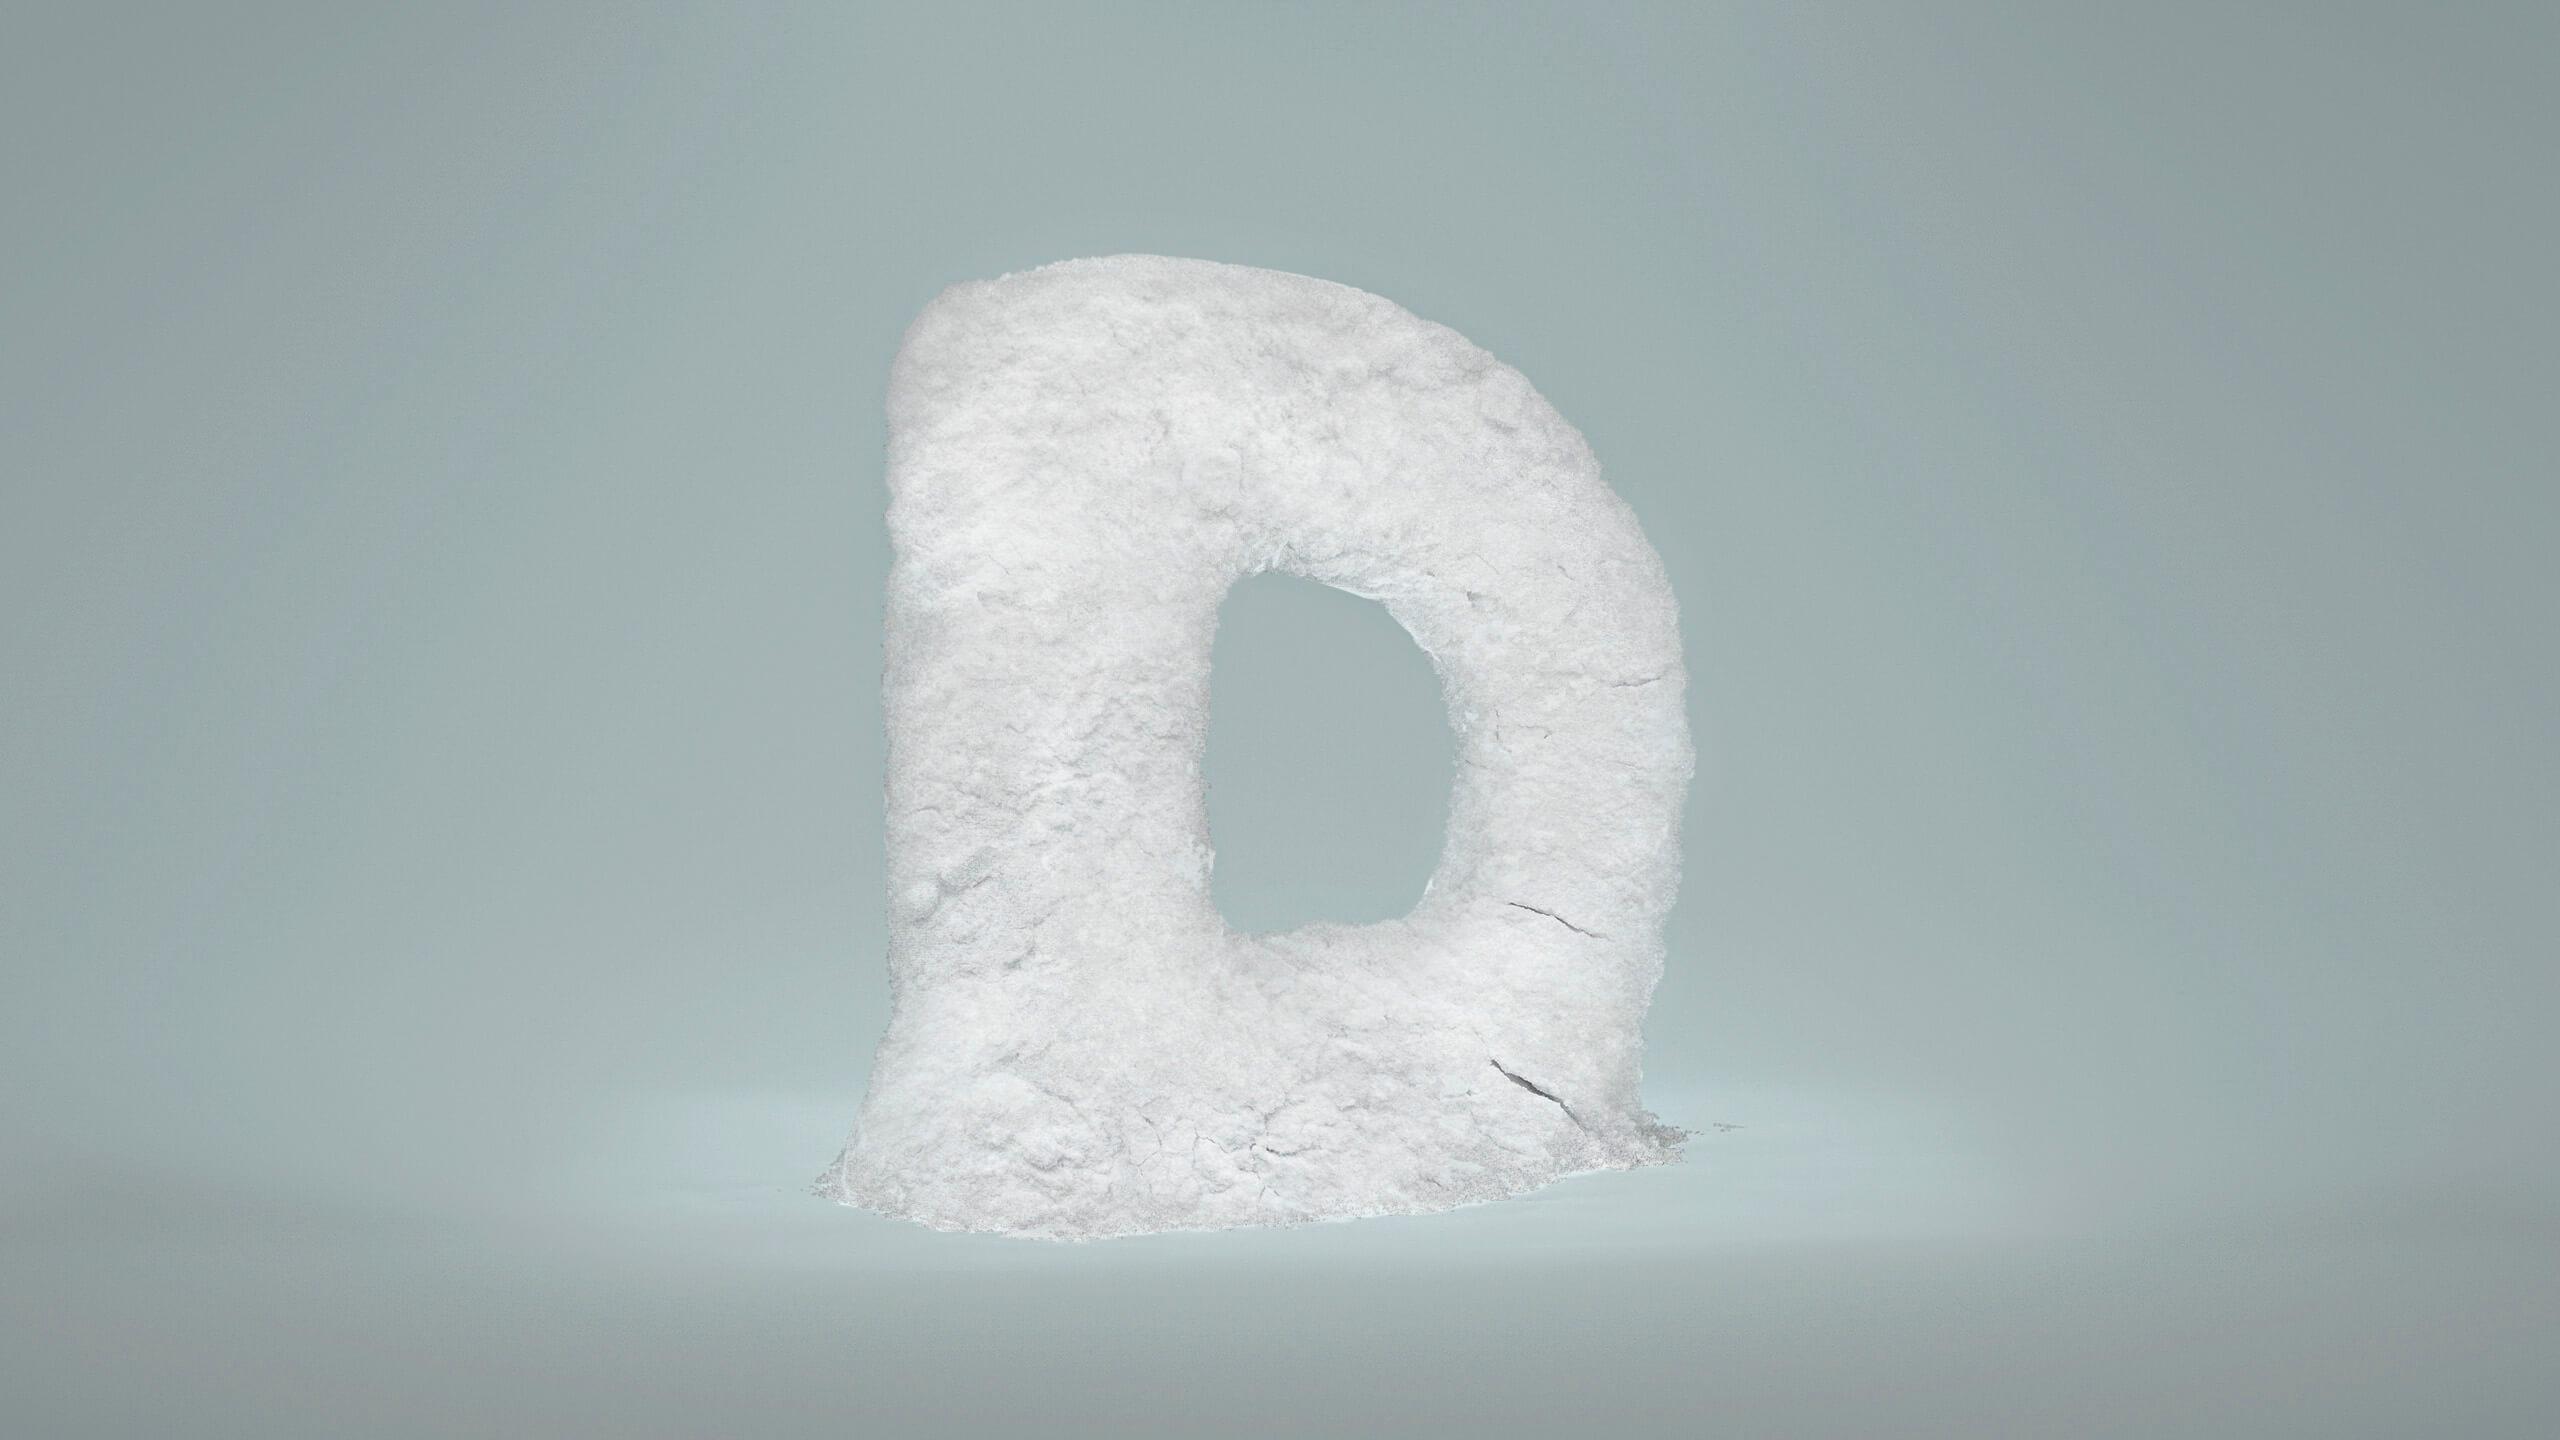 D-Drogen_2560x1440_300